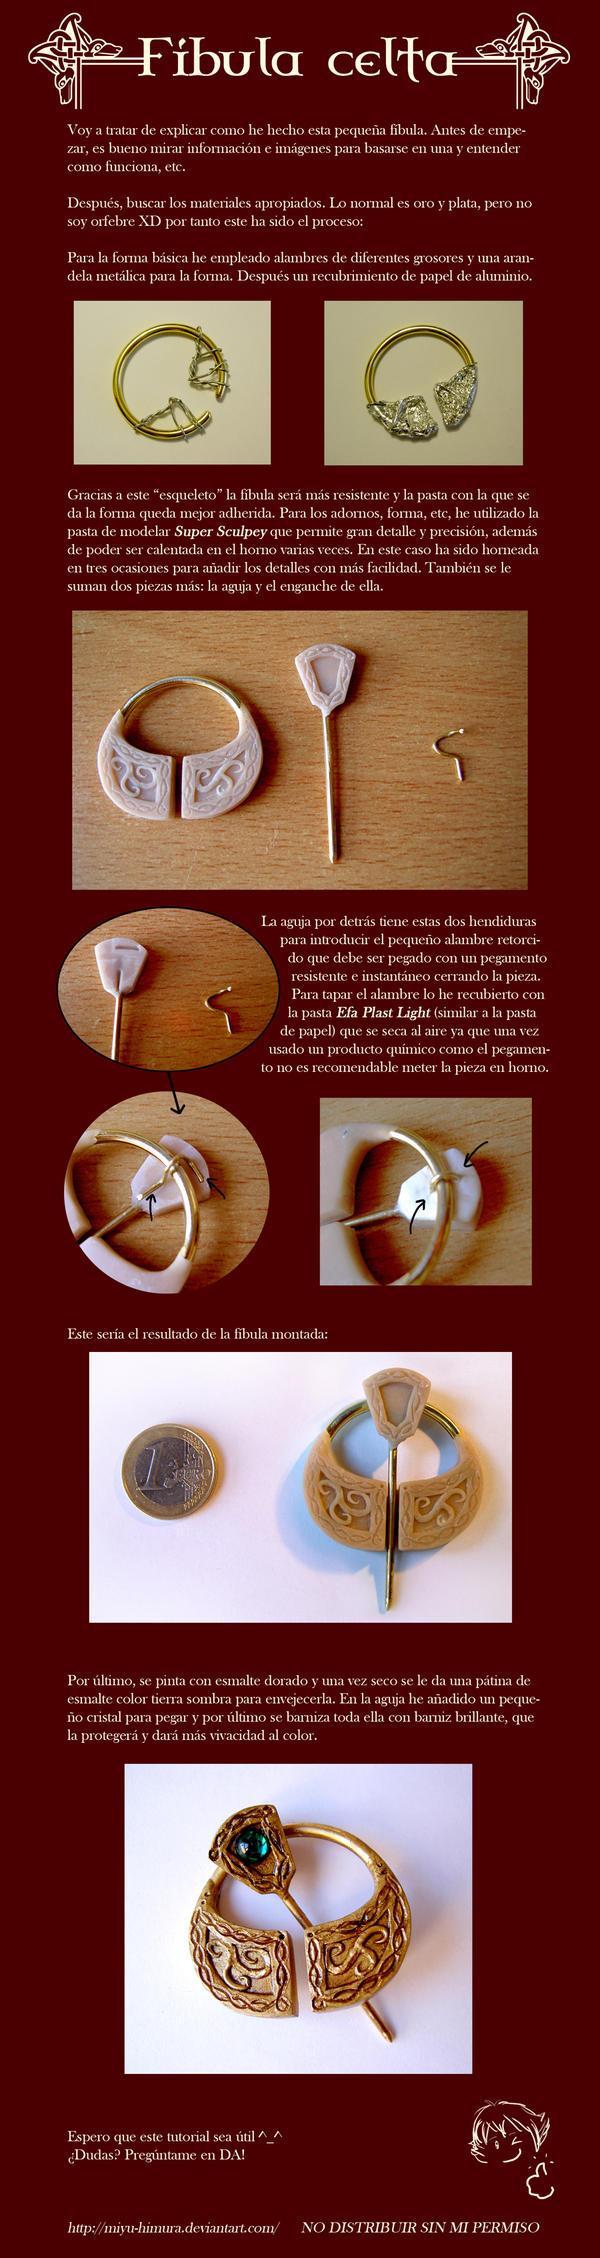 Tutorial - fibula celta by Boudicca-Keltoi